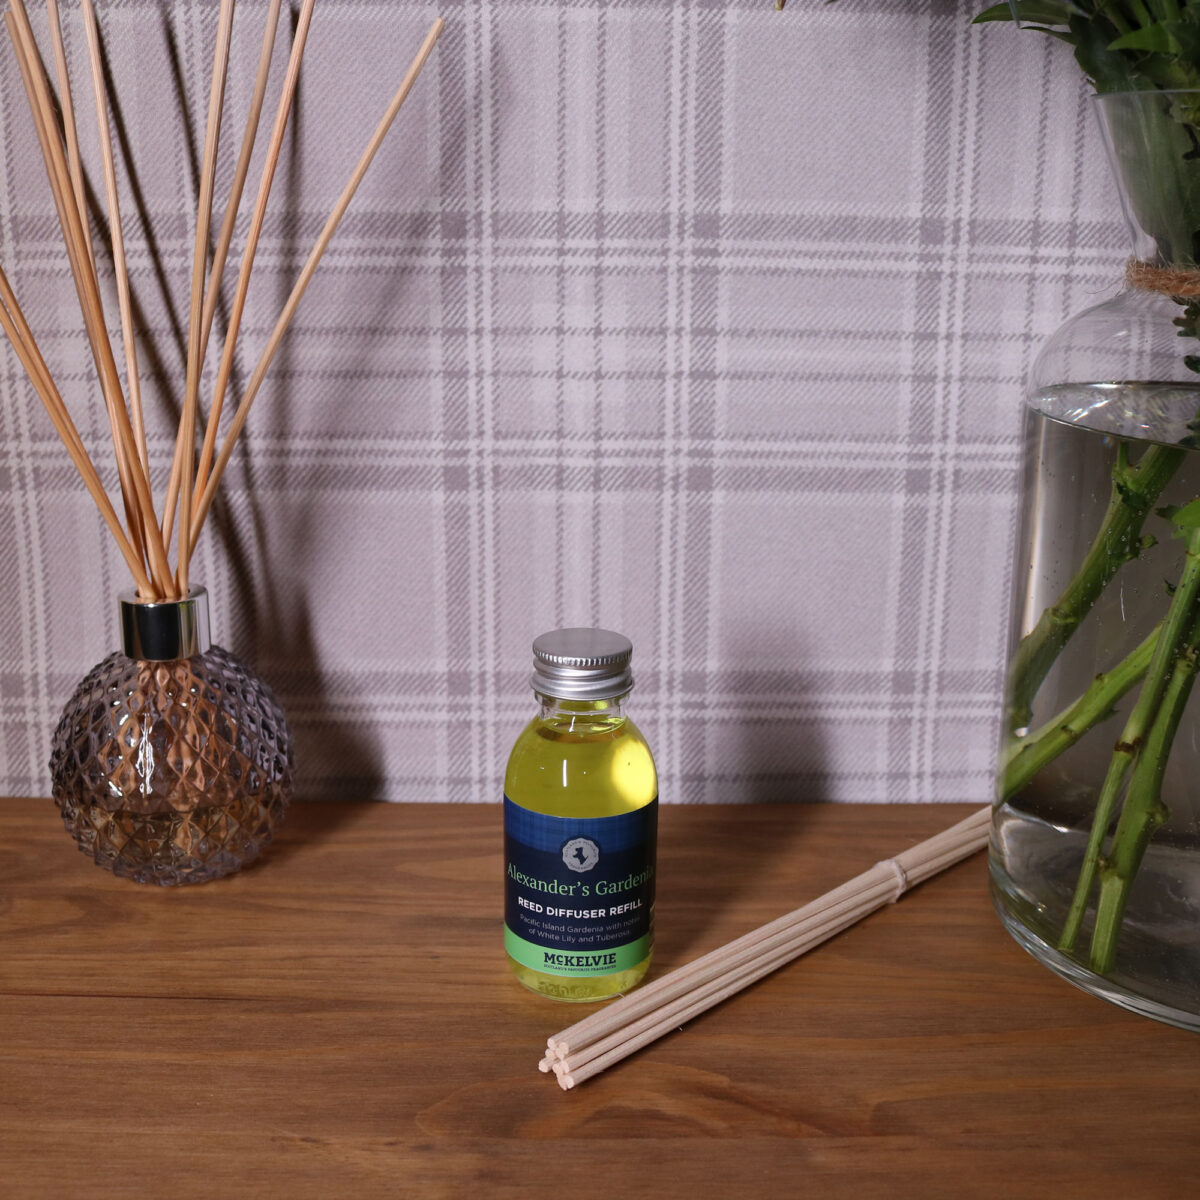 Alexanders Gardenia Reed Diffuser Refill